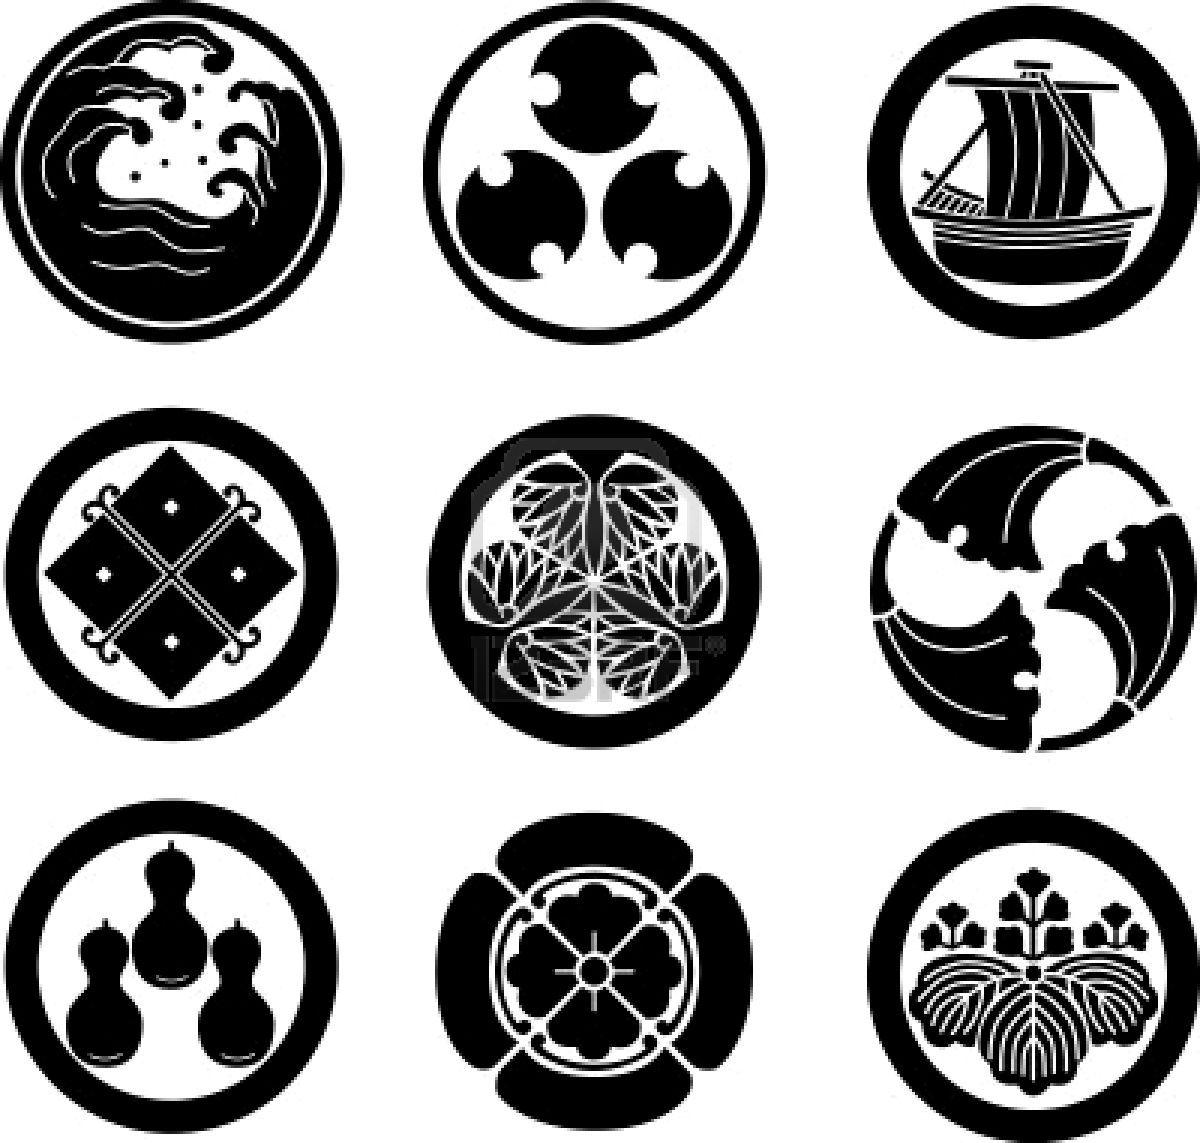 Japanese kamon crest httpenpediawikikamoncrest what do the family crests mon mean buycottarizona